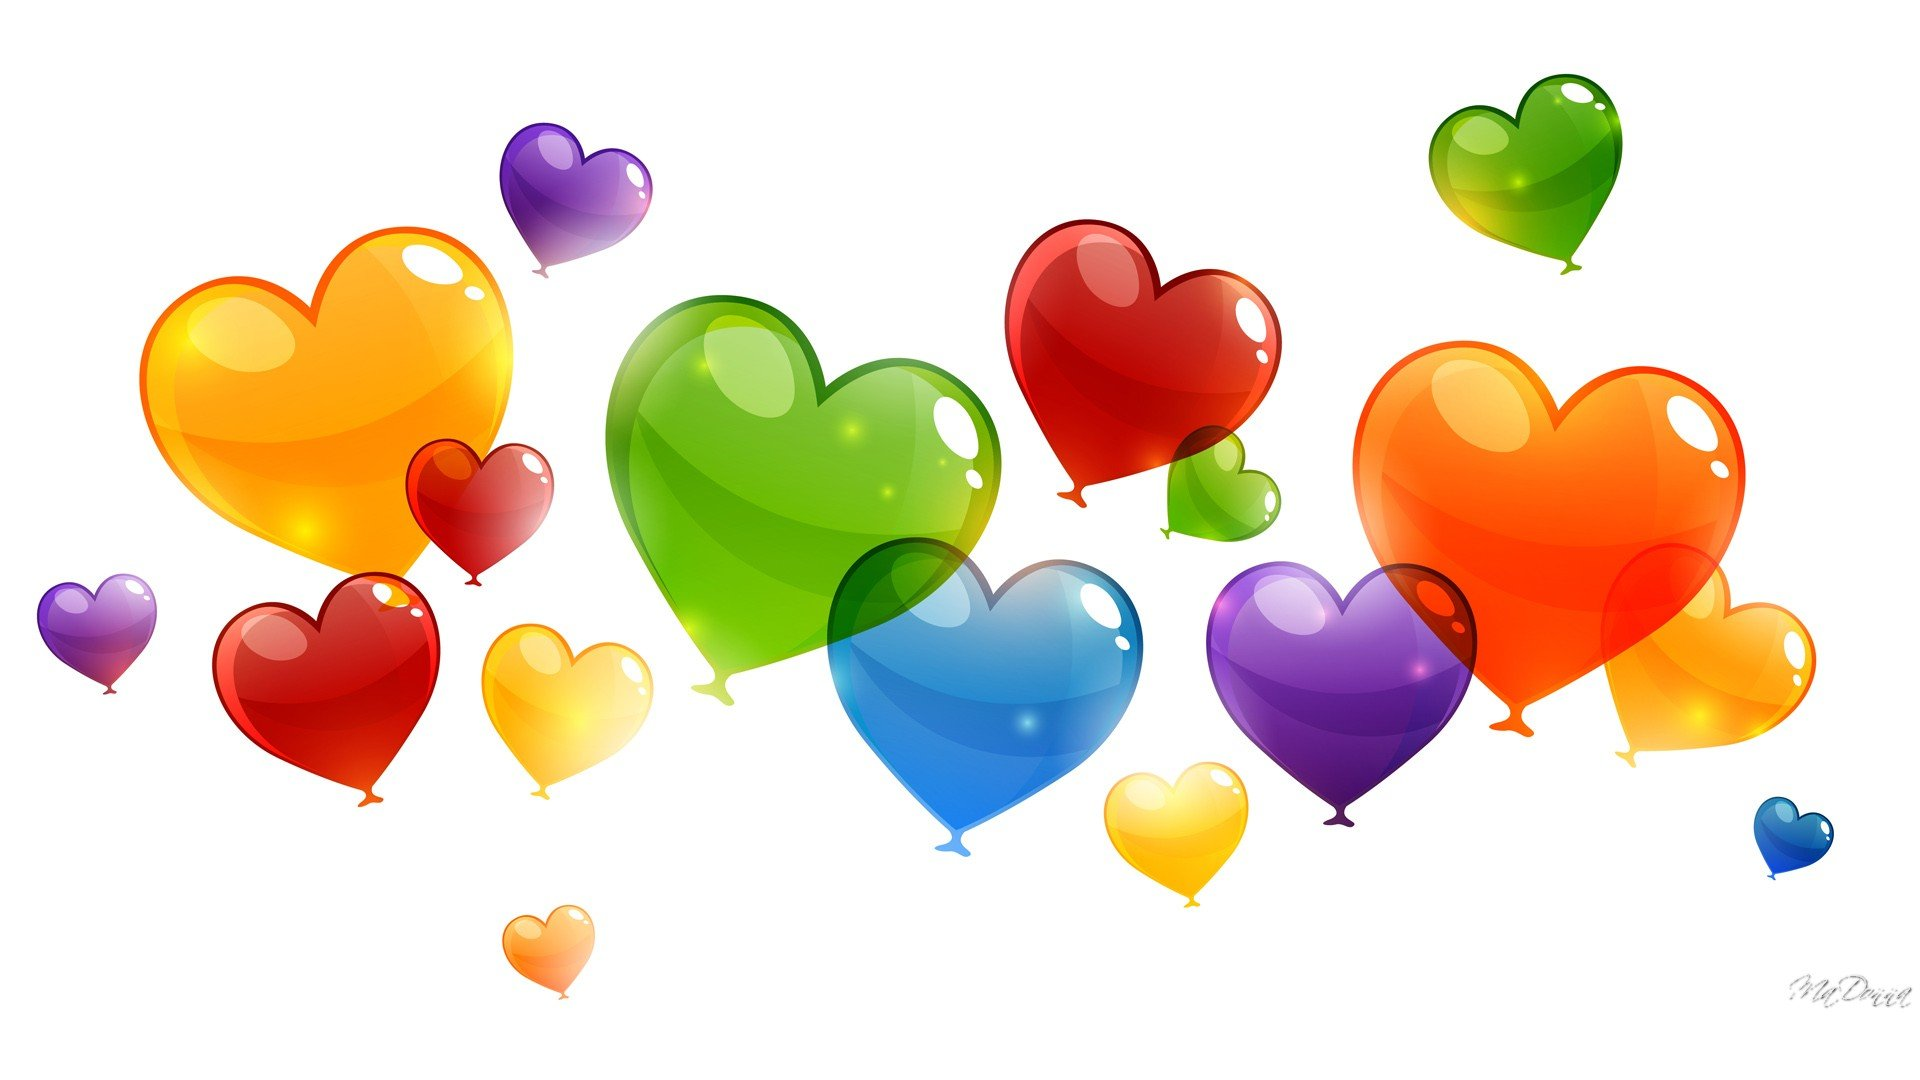 colorful hot air balloon wallpaper happy balloons hd wallpaper 510780 1920x1080